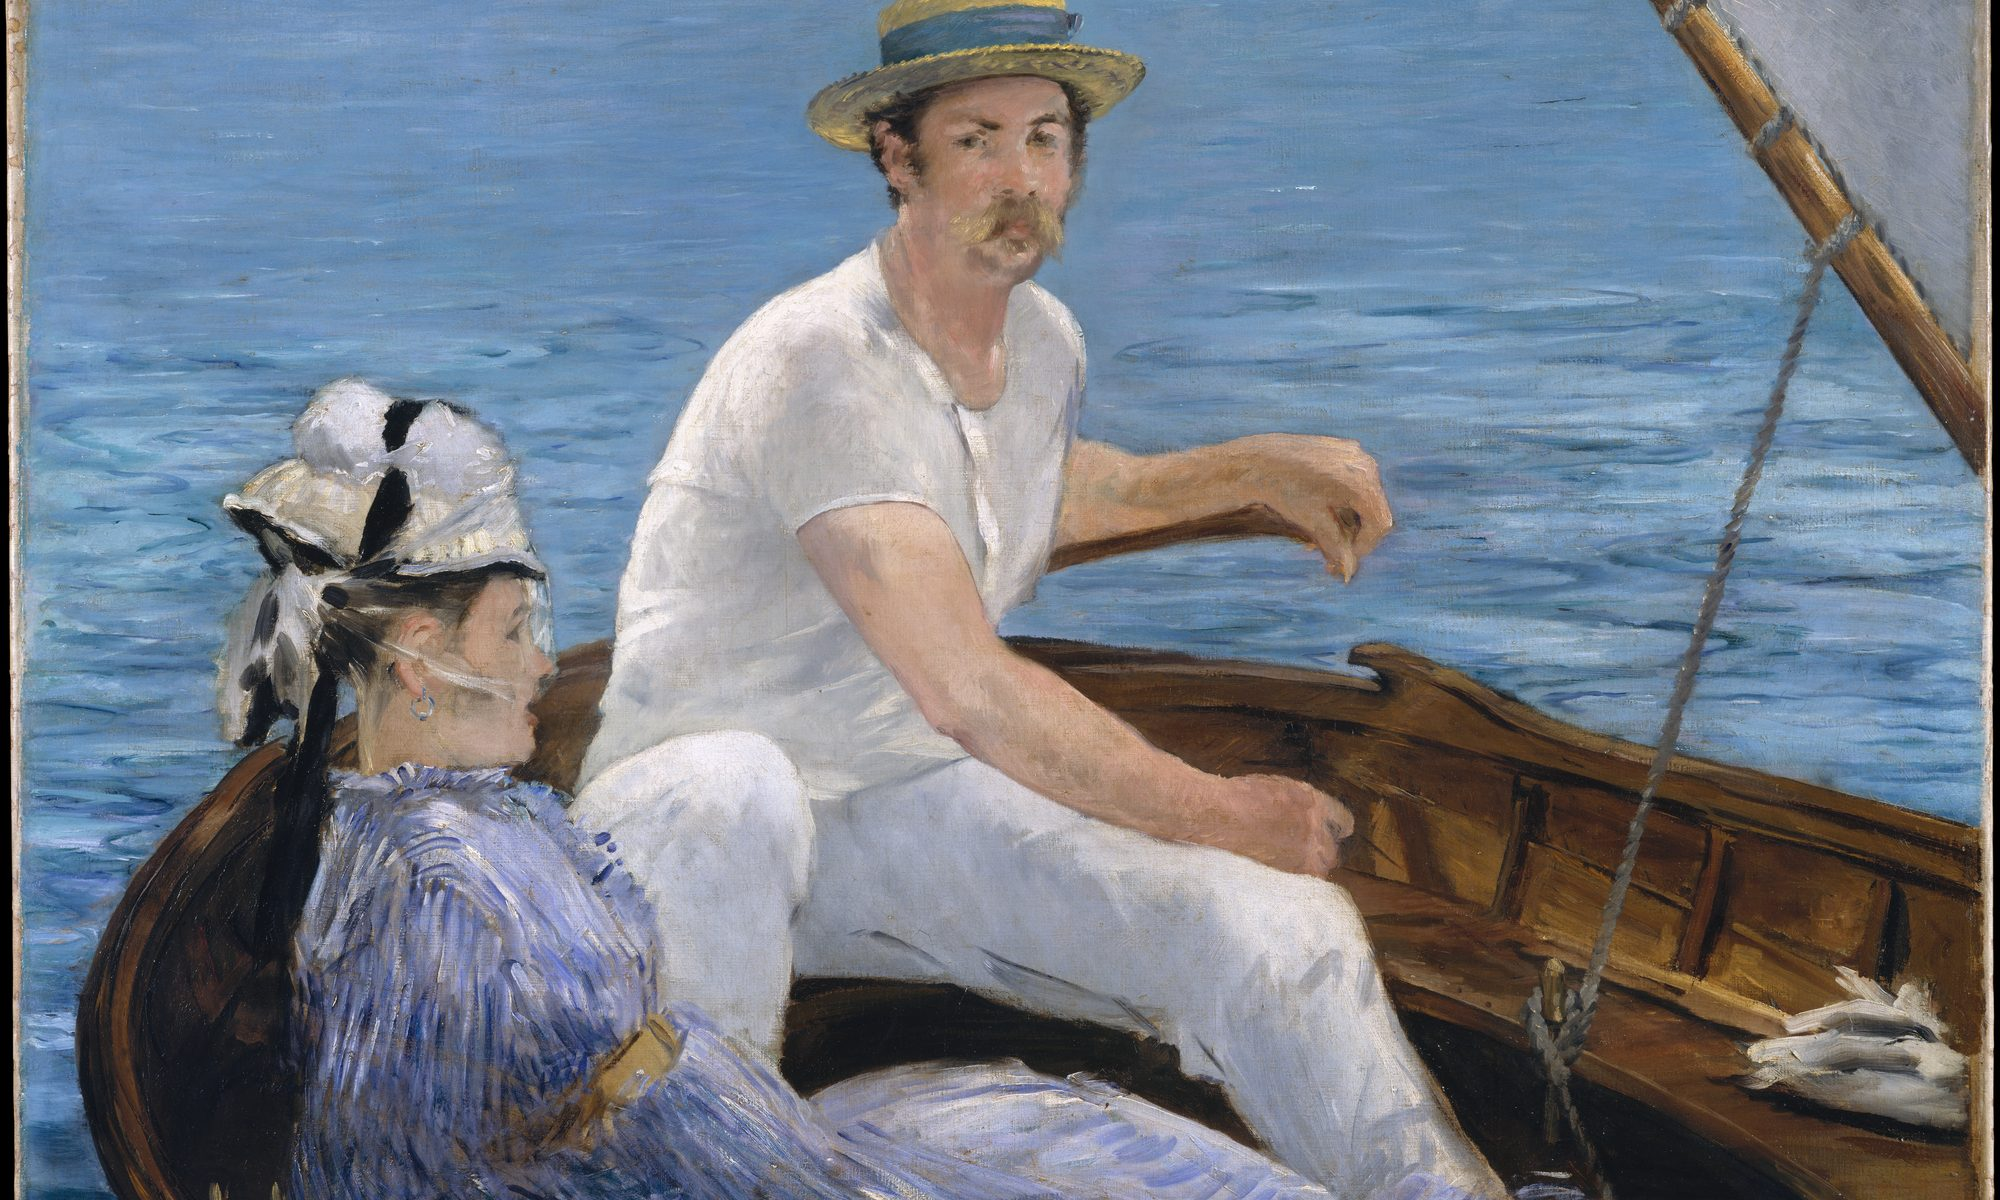 Édouard Manet, Public domain, via Wikimedia Commons Impressionist